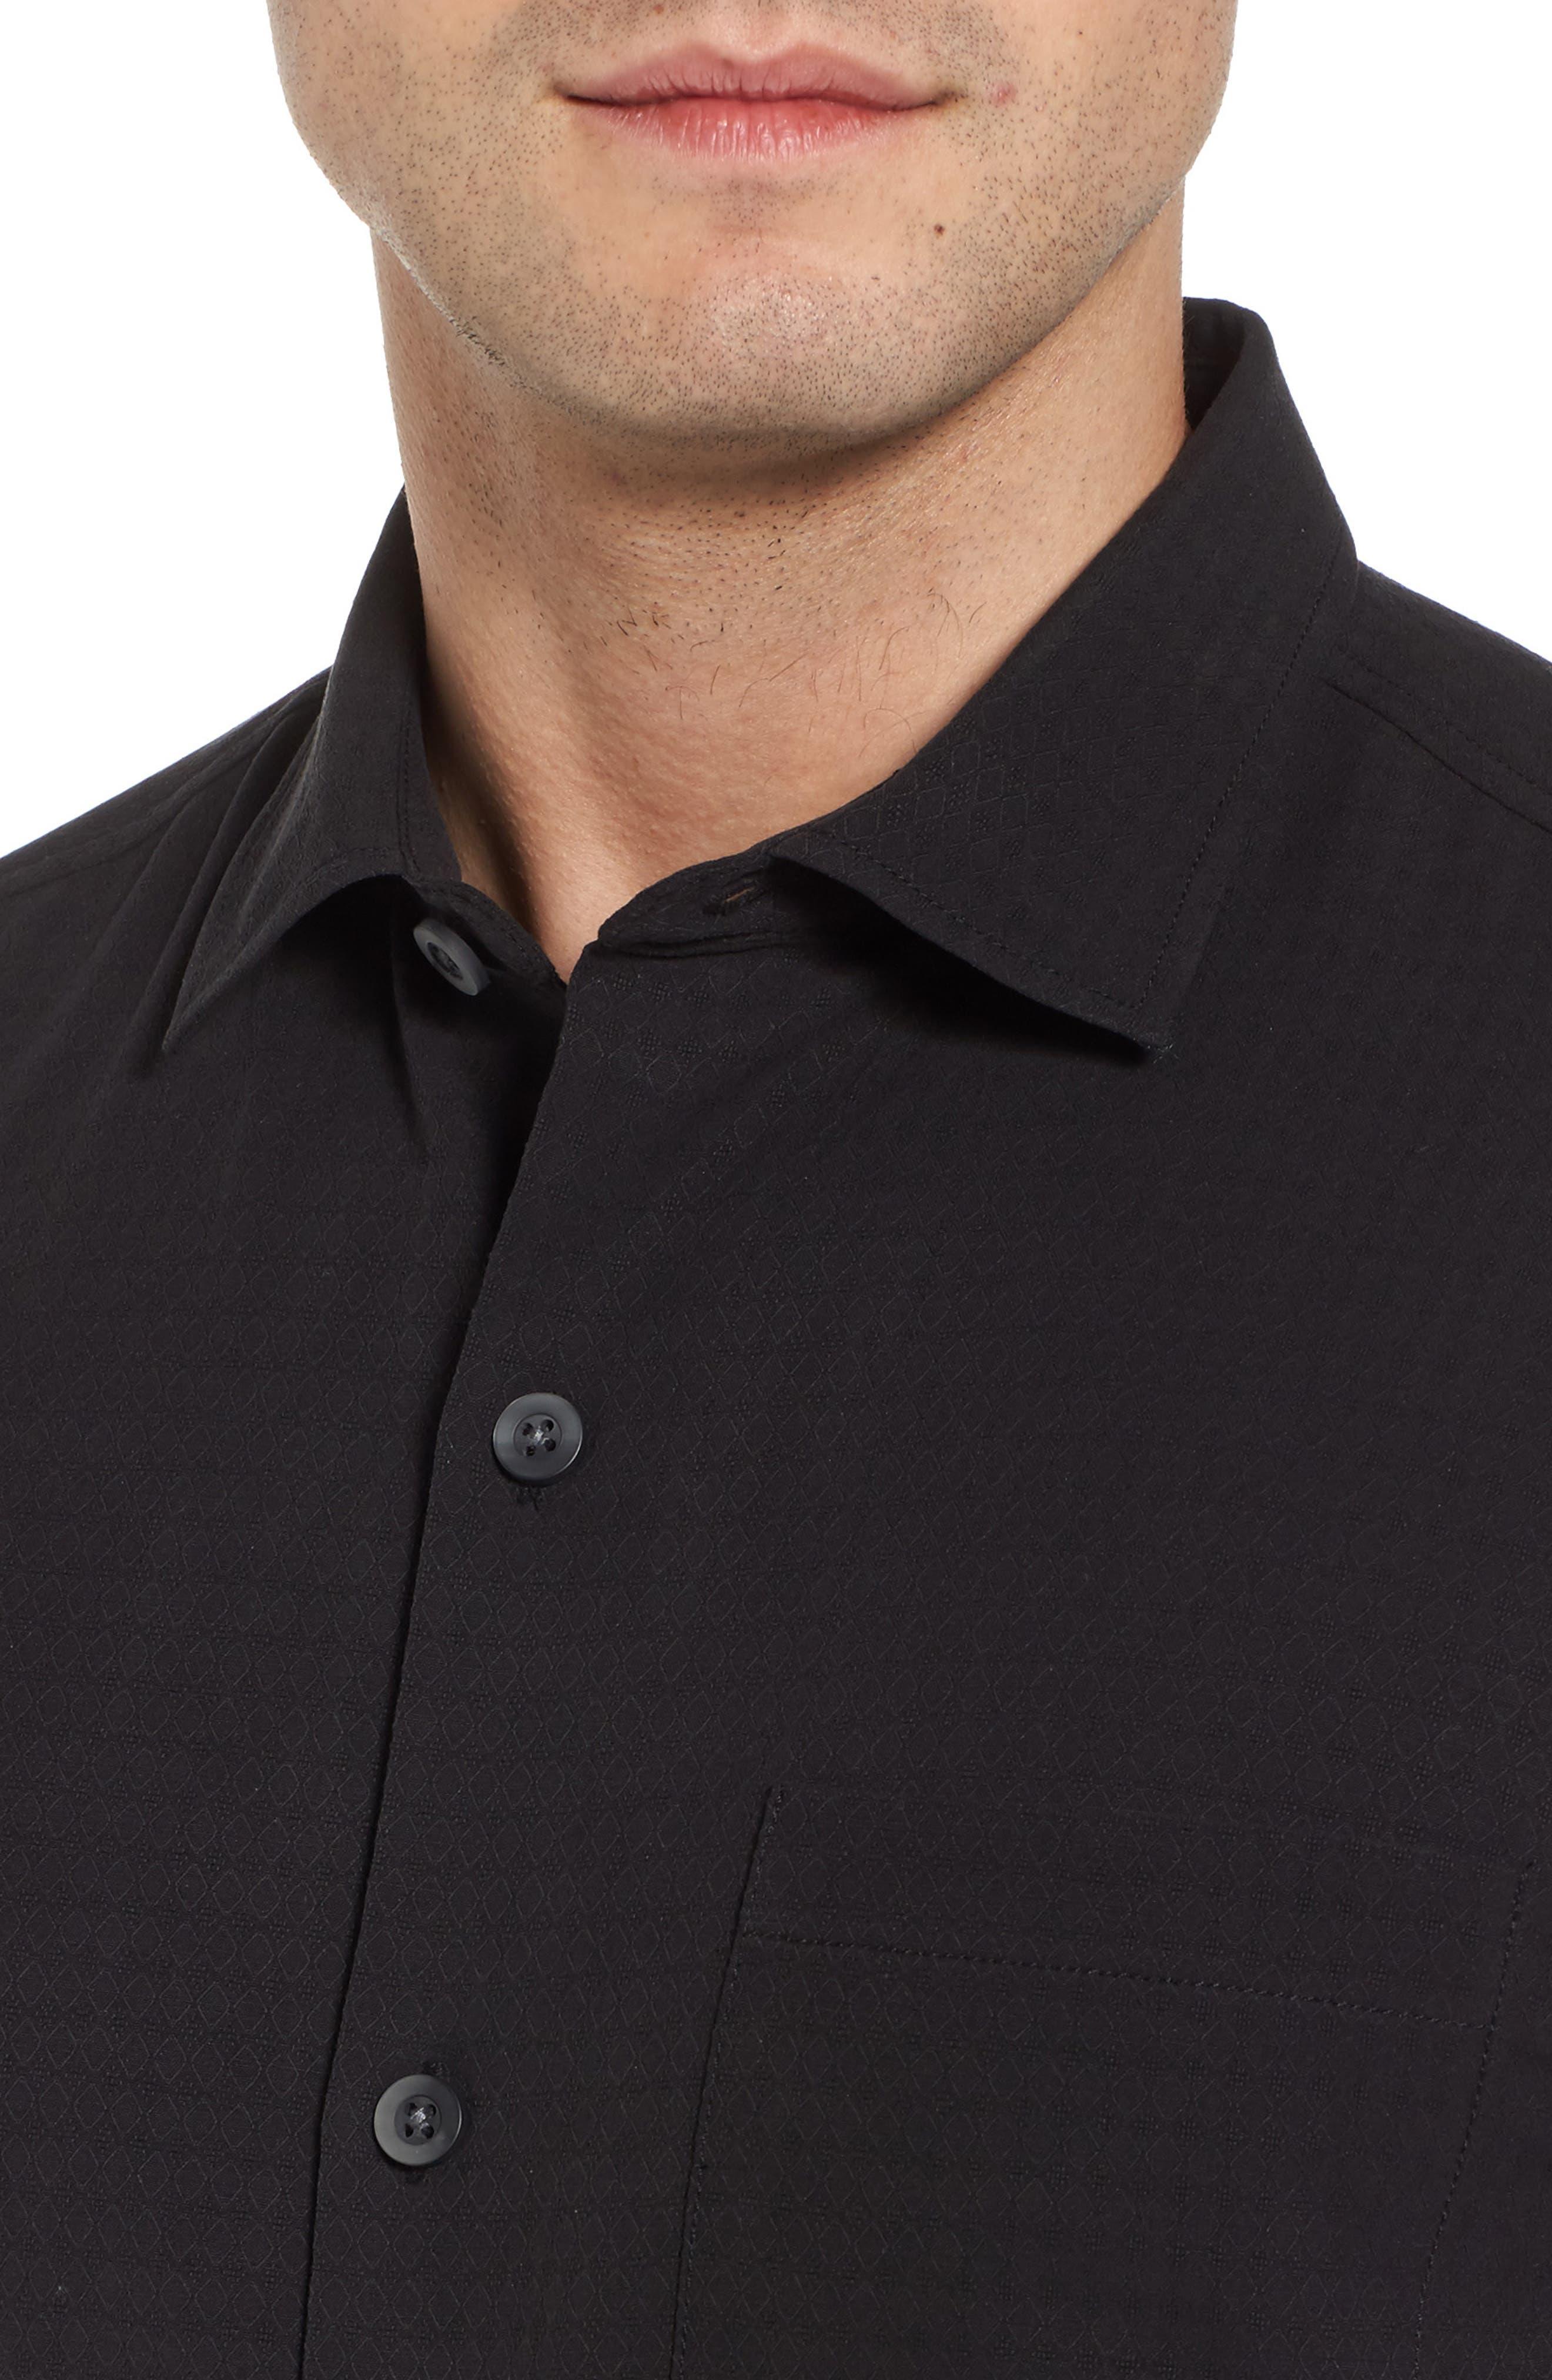 Oasis Jacquard Silk Sport Shirt,                             Alternate thumbnail 4, color,                             001